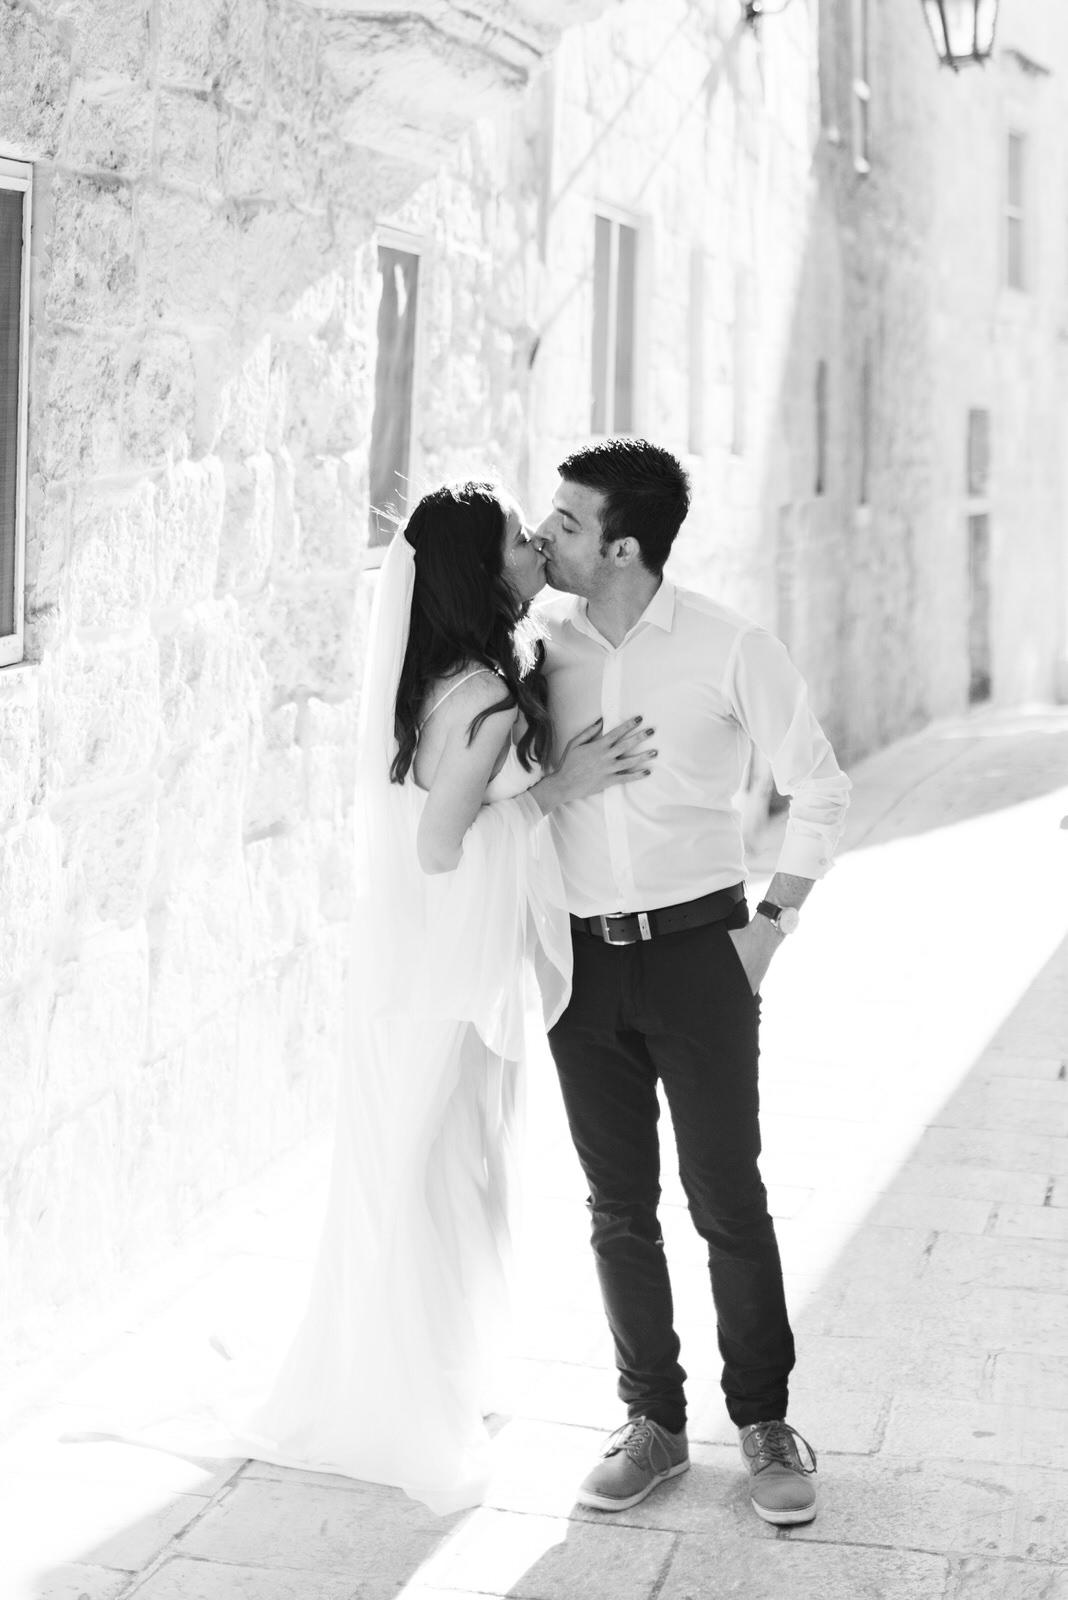 mdina wedding, malta wedding photography, malta elopement, golden bay malta wedding photos, wedding photographer malta, malta wedding venue, villa bologna wedding (35).jpg